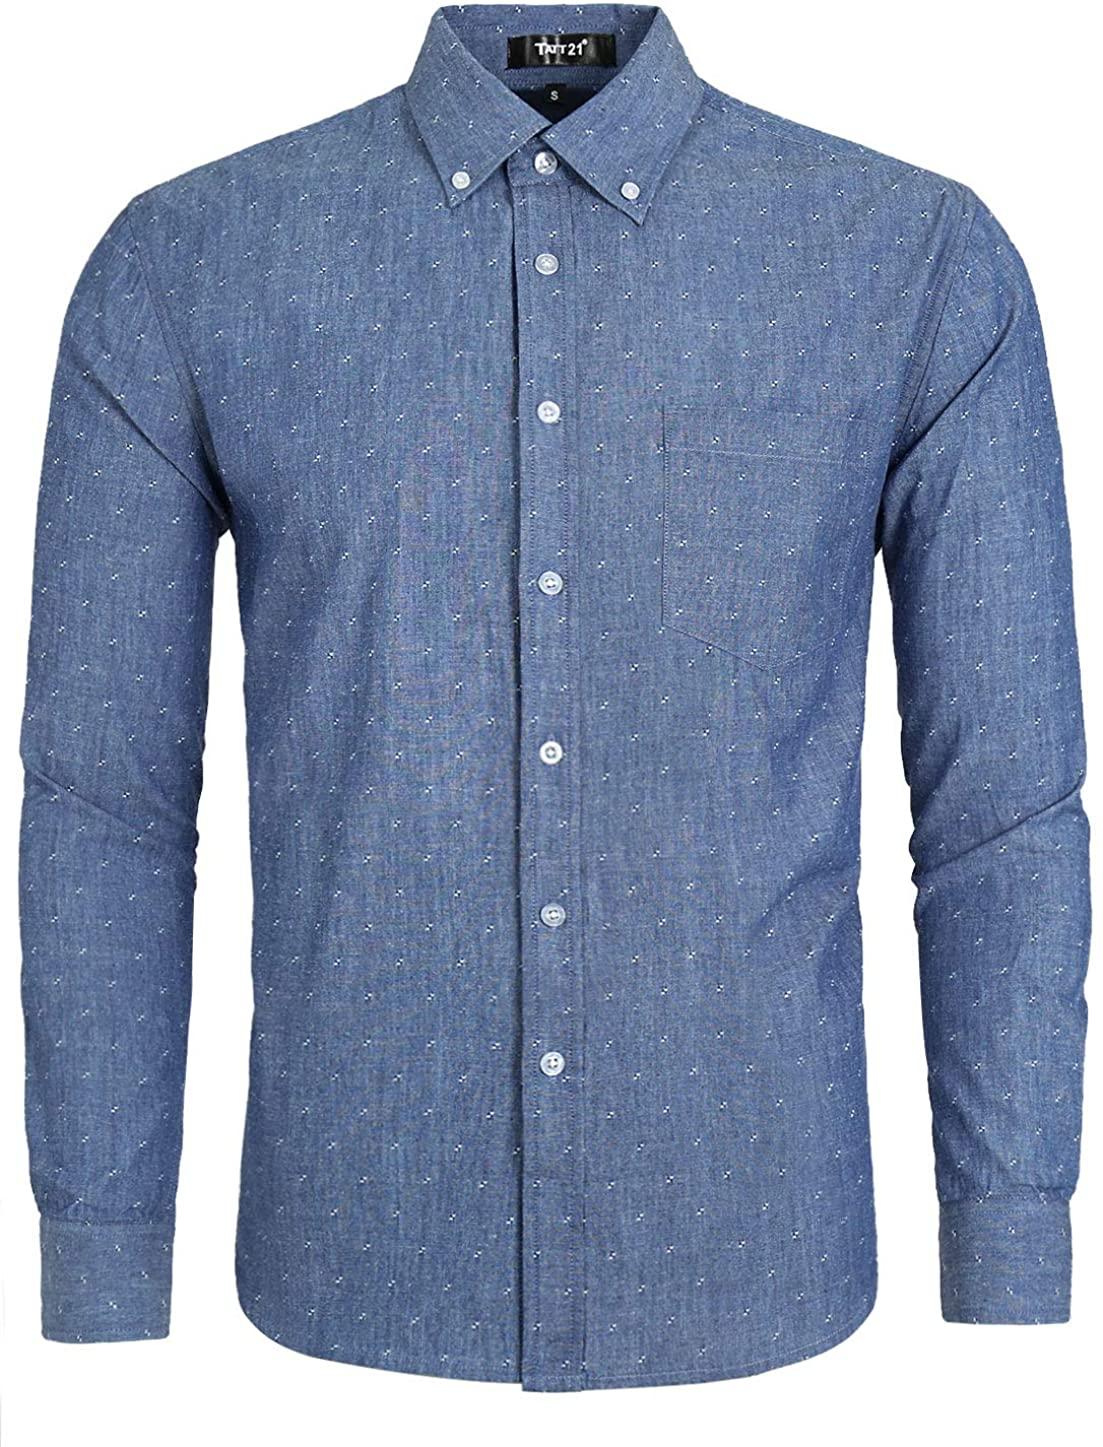 TATT 21 Men Denim Shirt Pocket Weave Casual Cotton Long Sleeve Button Down Work Shirts